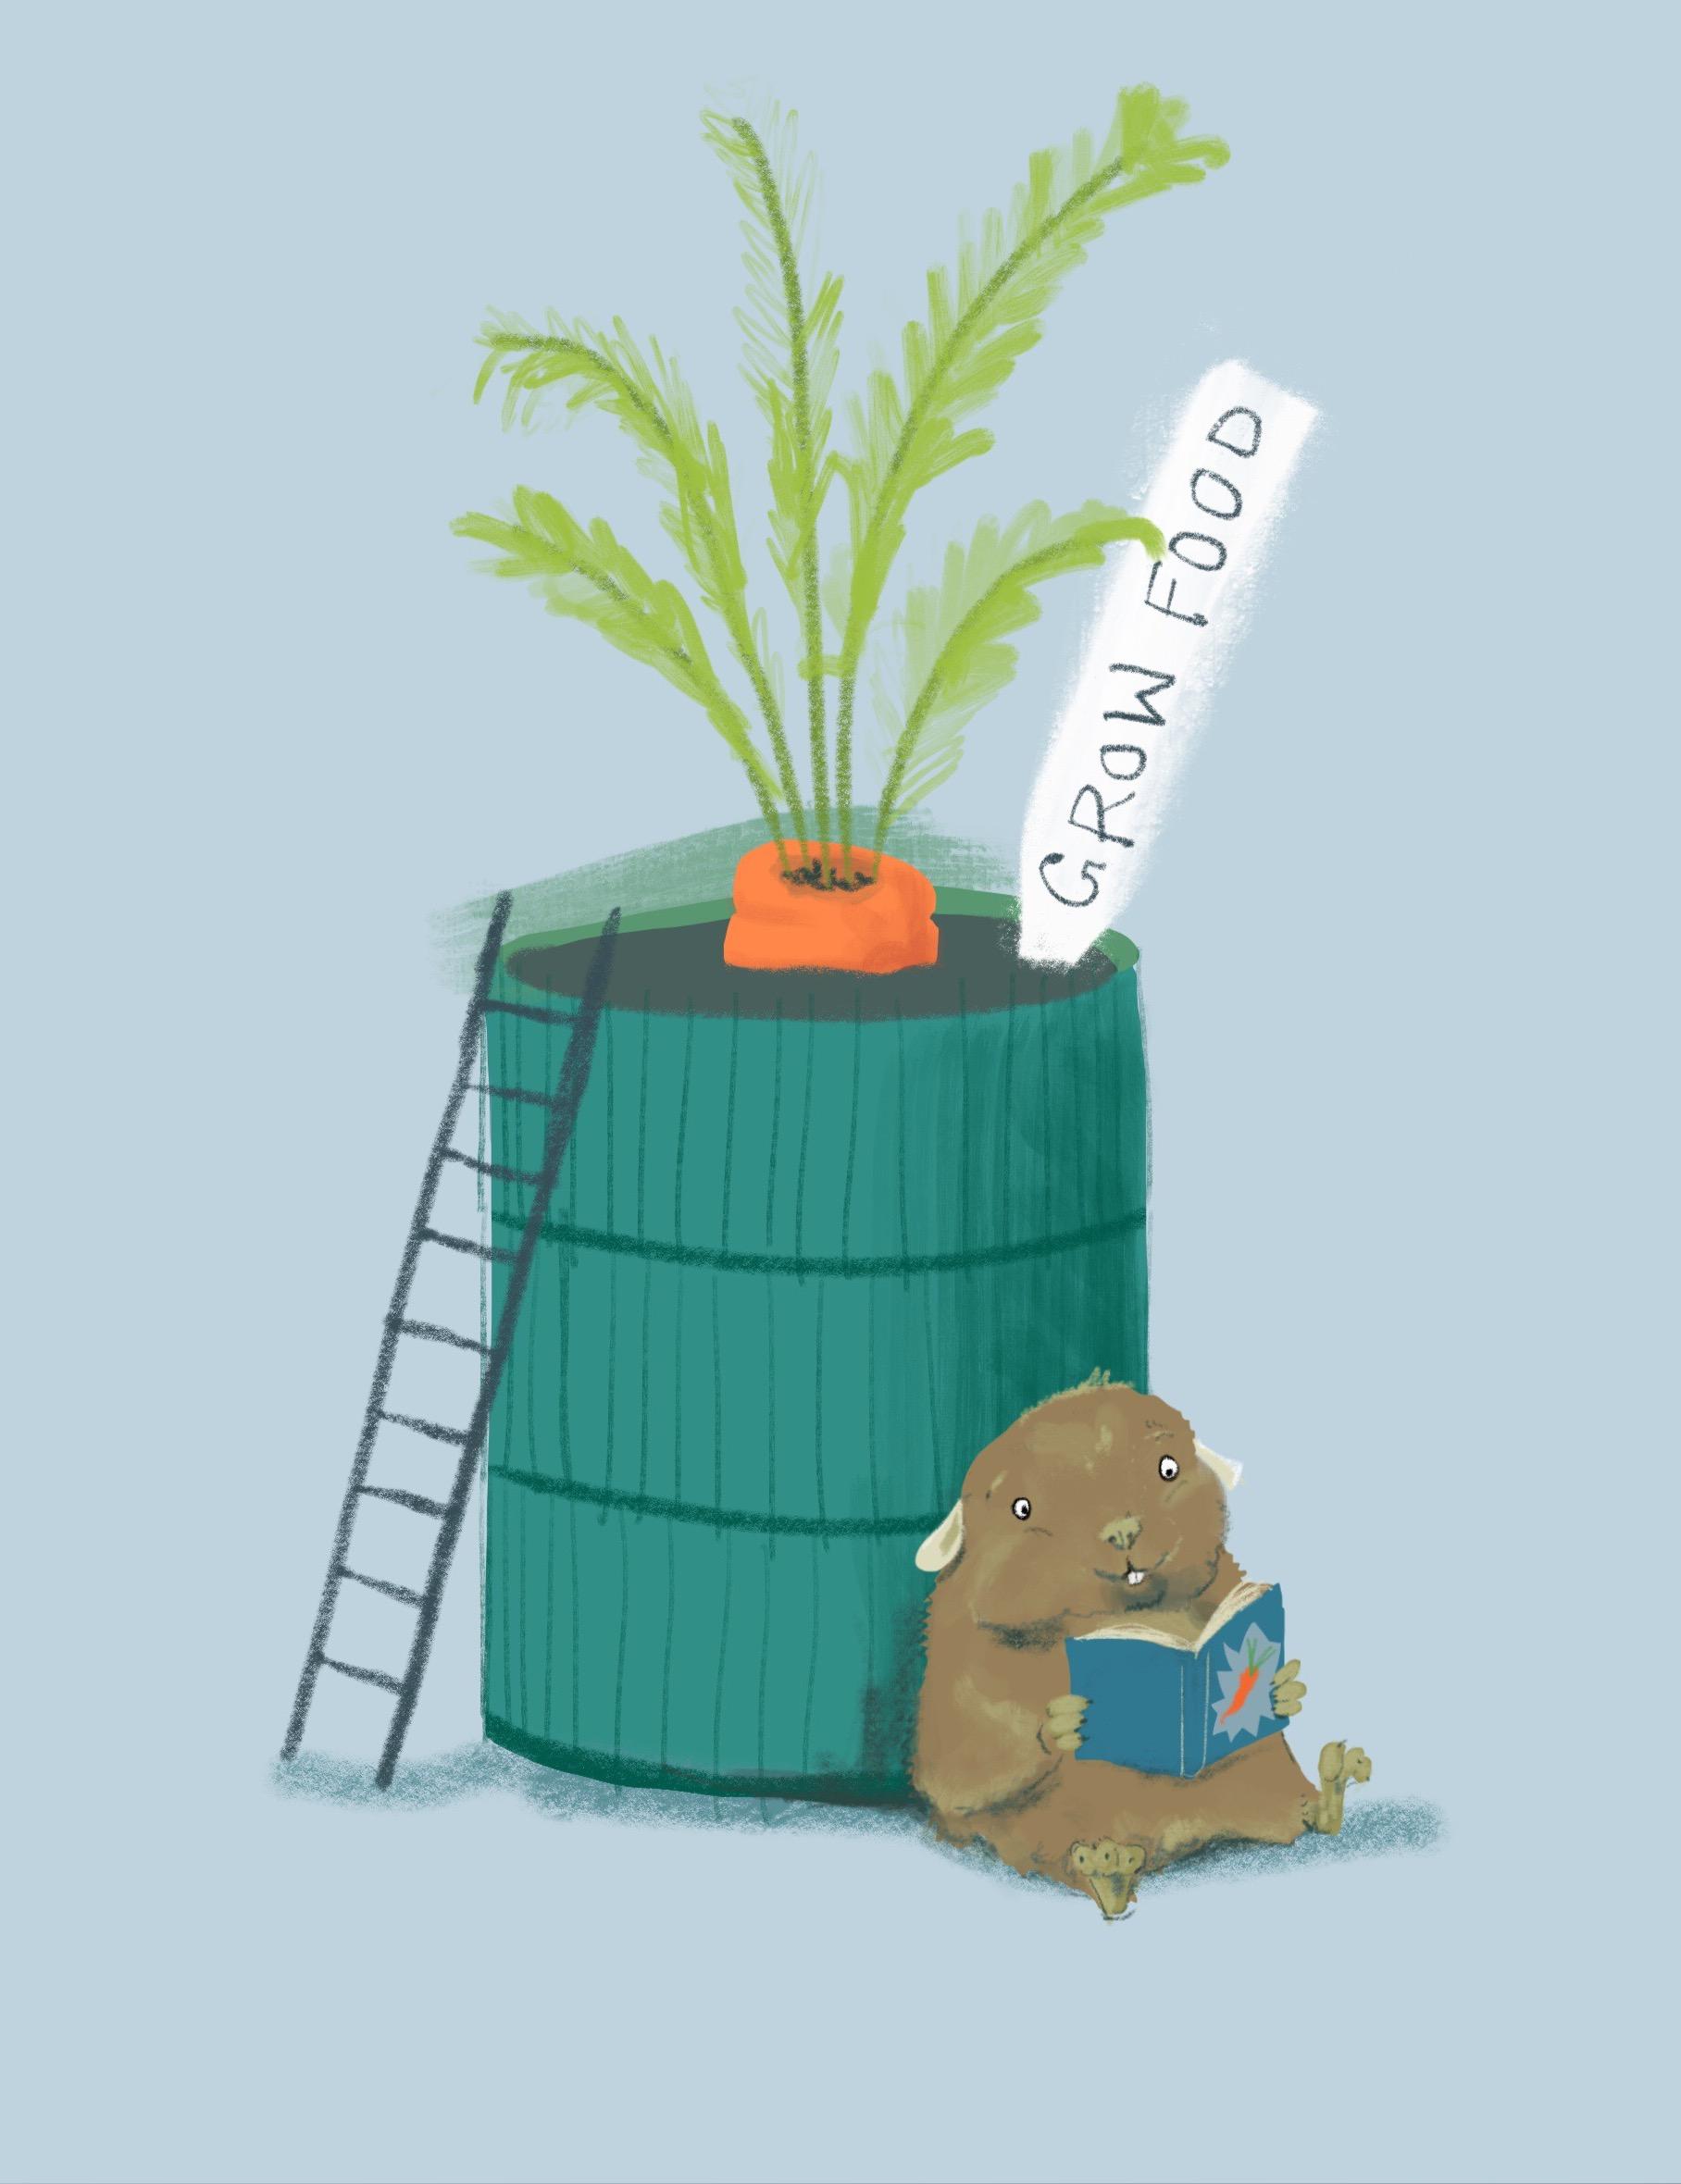 02_GrowYourOwnFood_How_to_Upcycle_Your_hamsterwheel_CC-BY-SA_JenniOttilieKeppler.jpeg